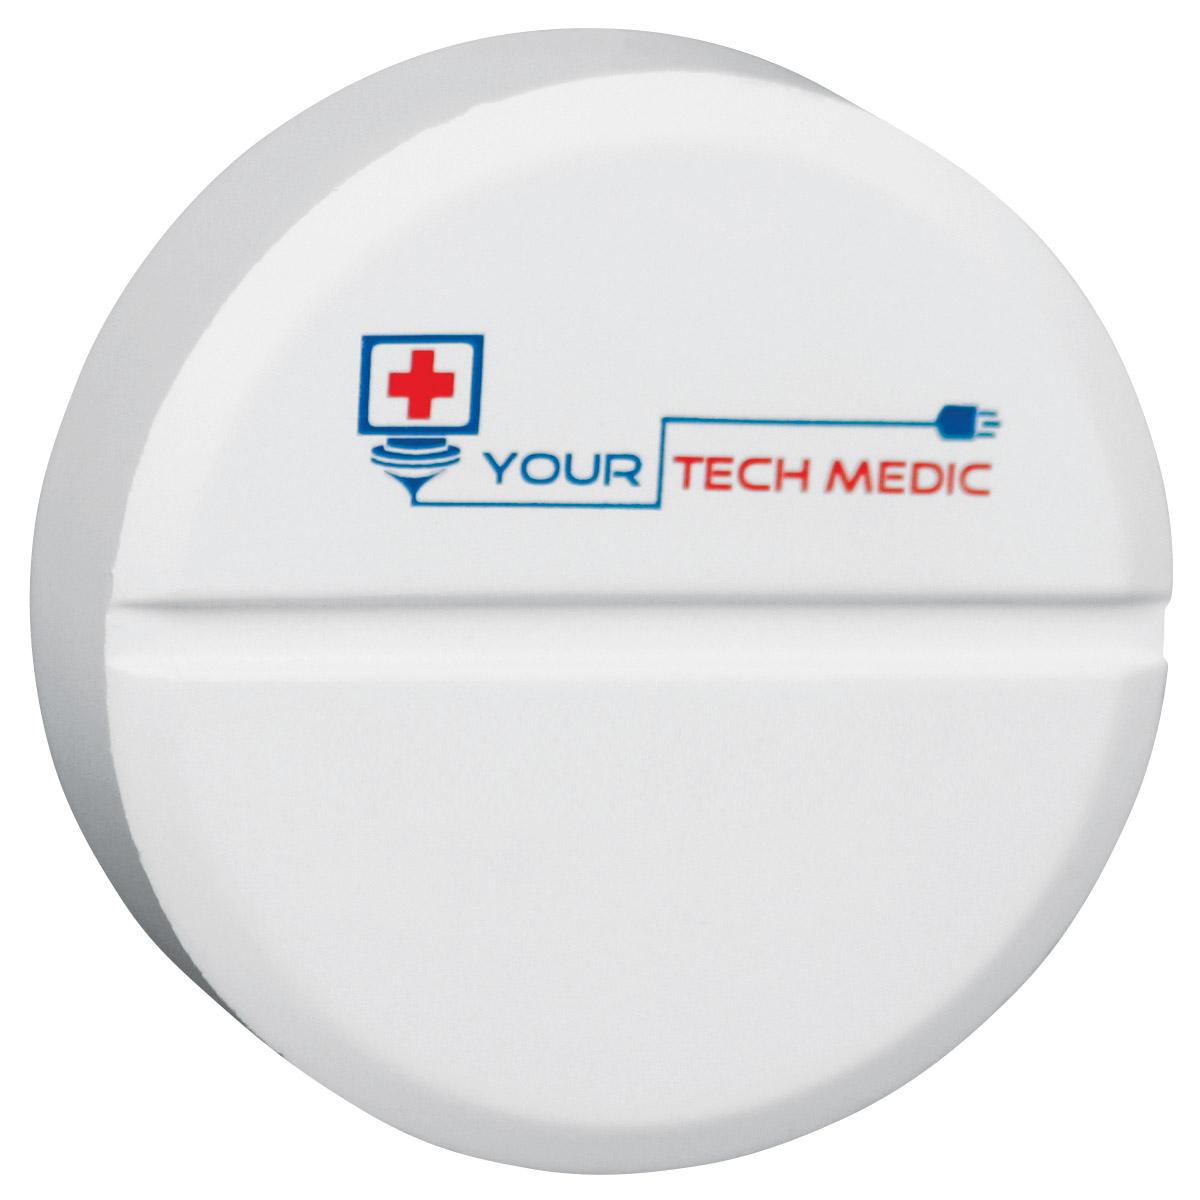 Tablet Pill Stress Reliever, LPH-PT02 - 1 Colour Imprint